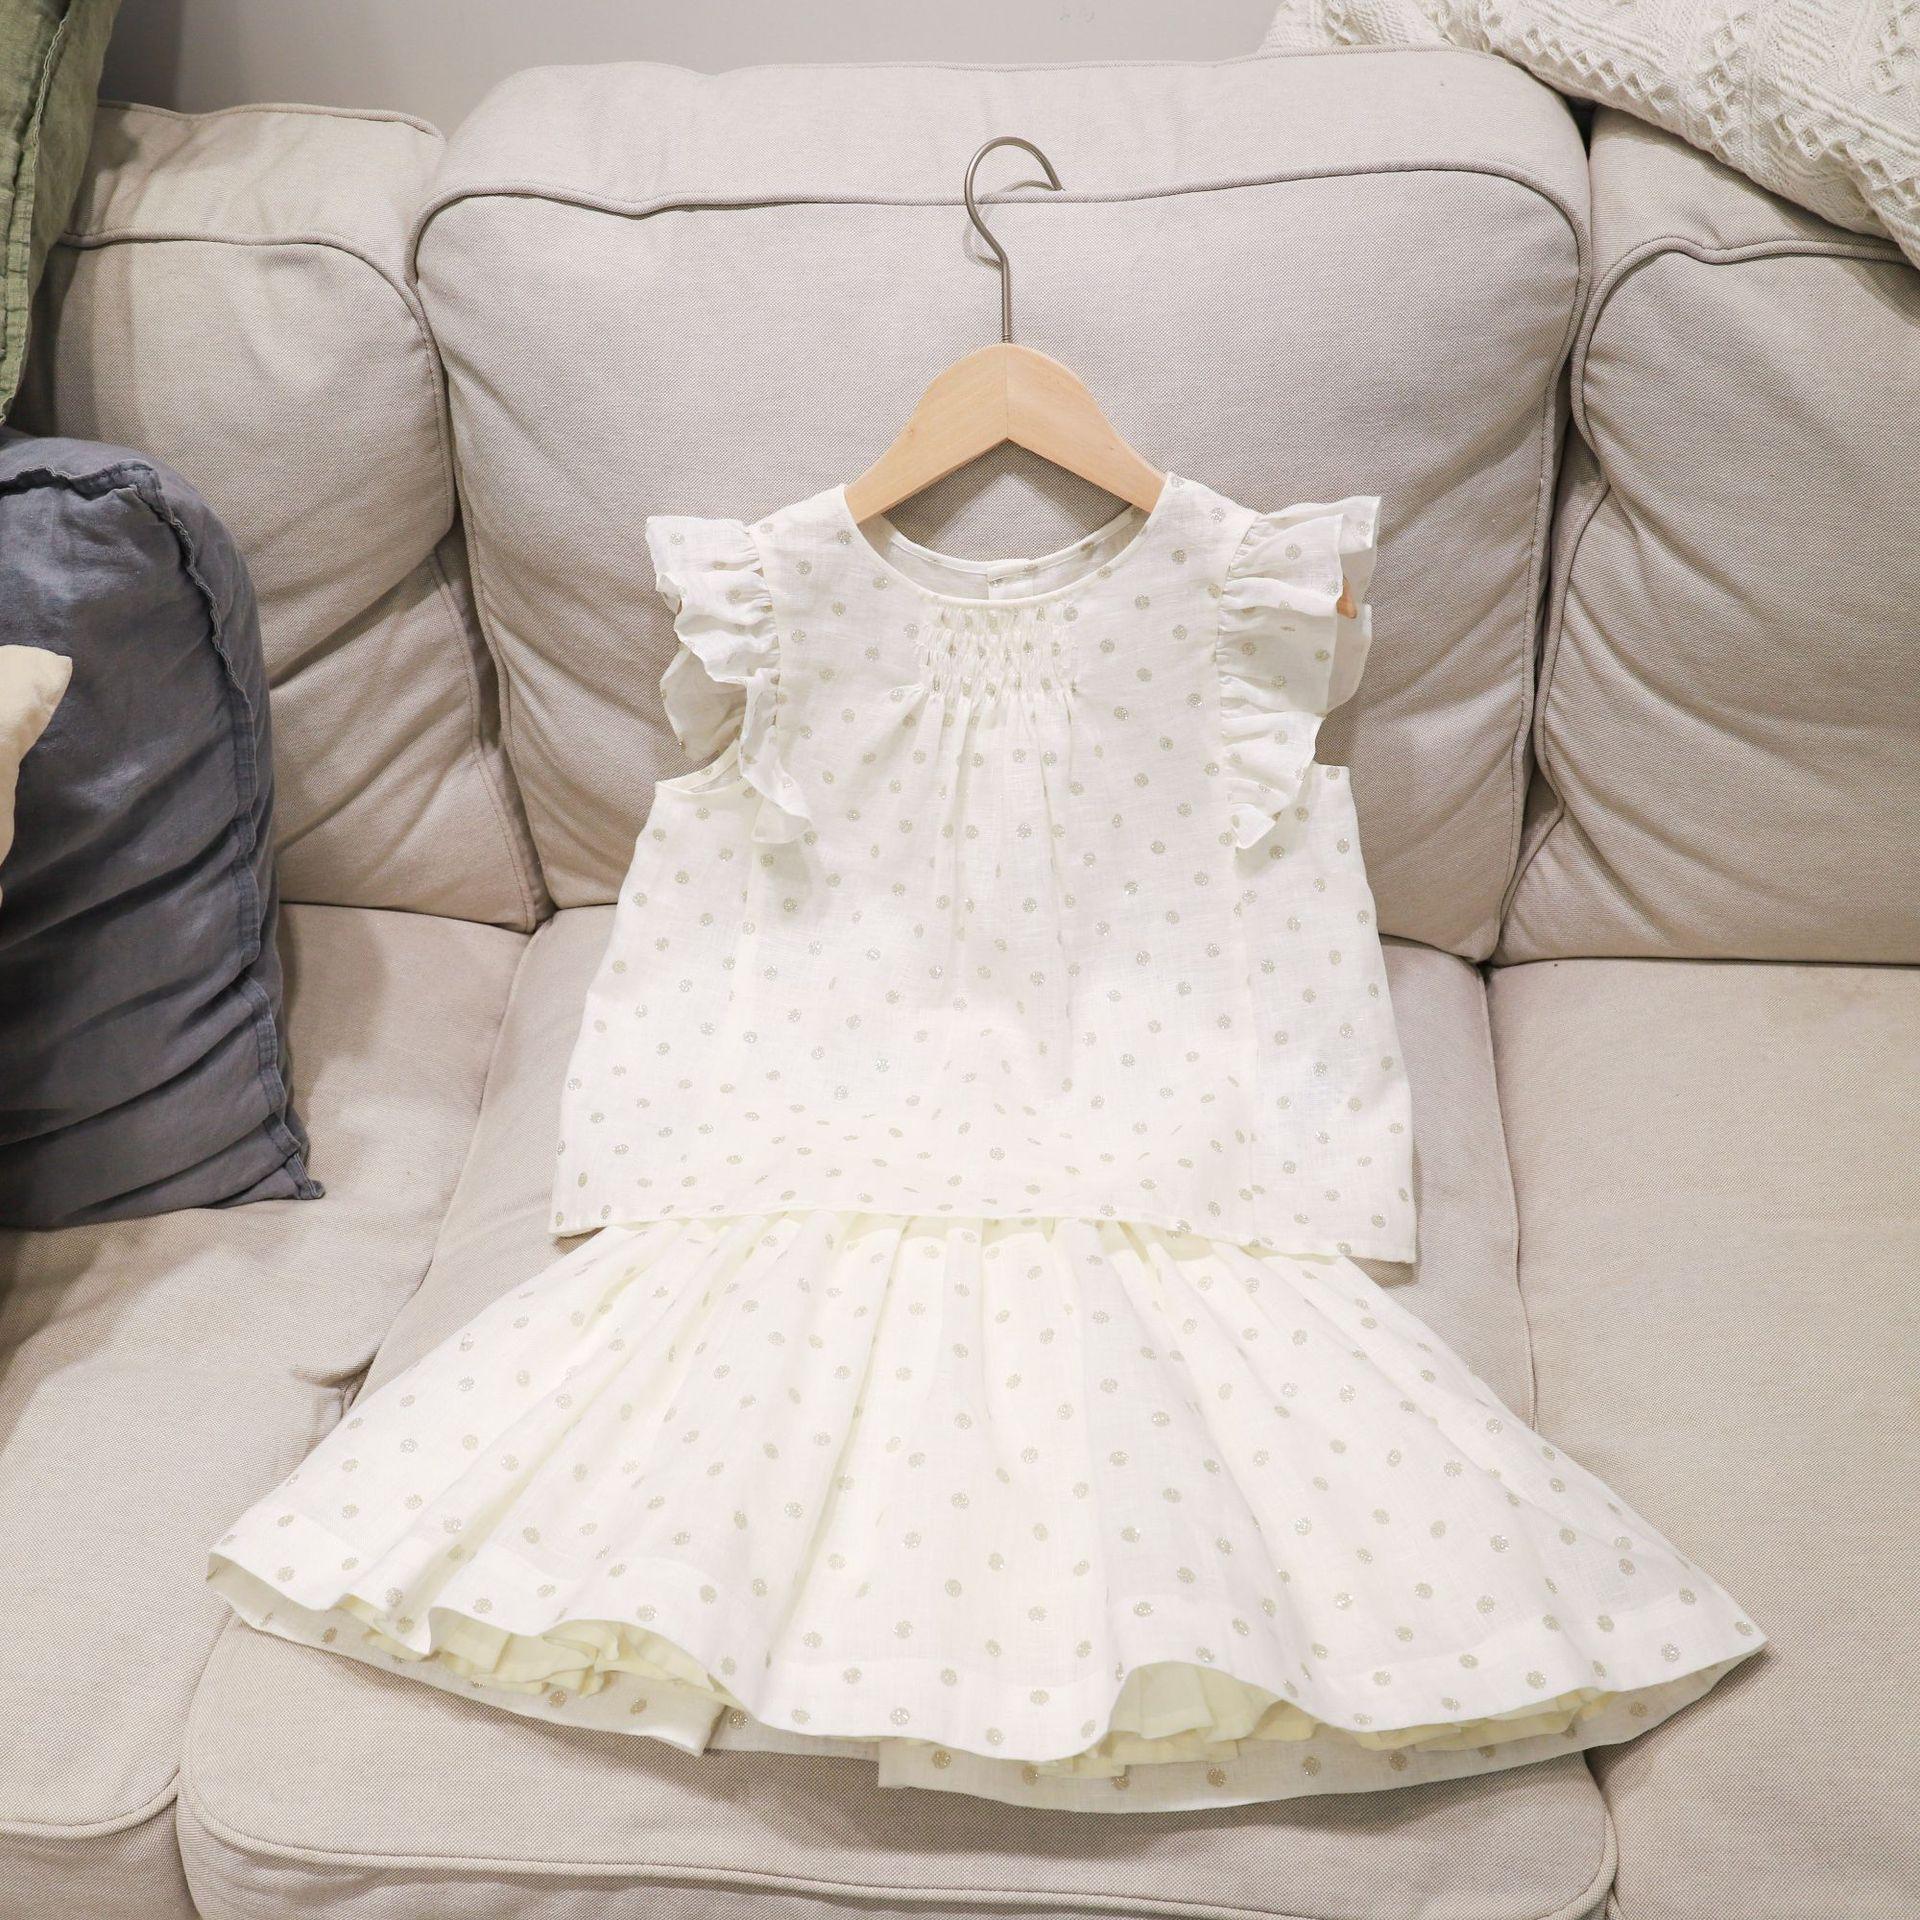 Pre-sell  April  10th Girls clothing set 2020 white color shining dot pattern girls tops + skirt 2pcs clothes set